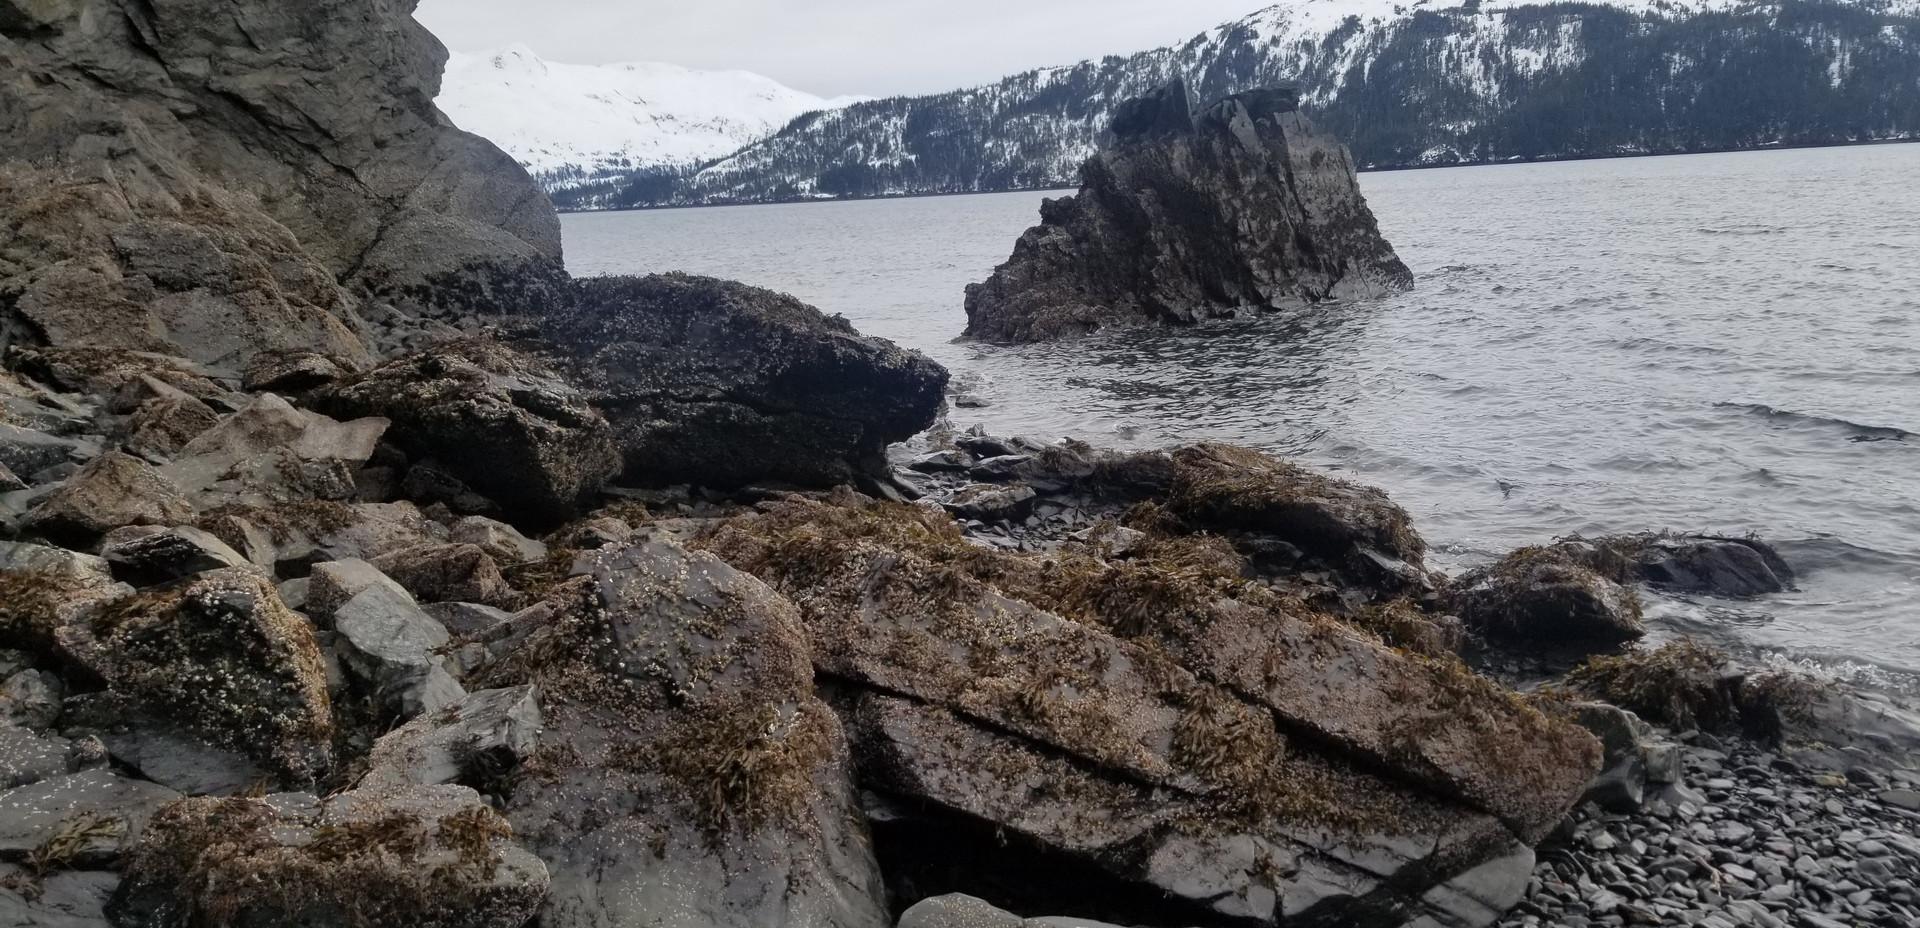 Blackstone Bay, Prince William Sound